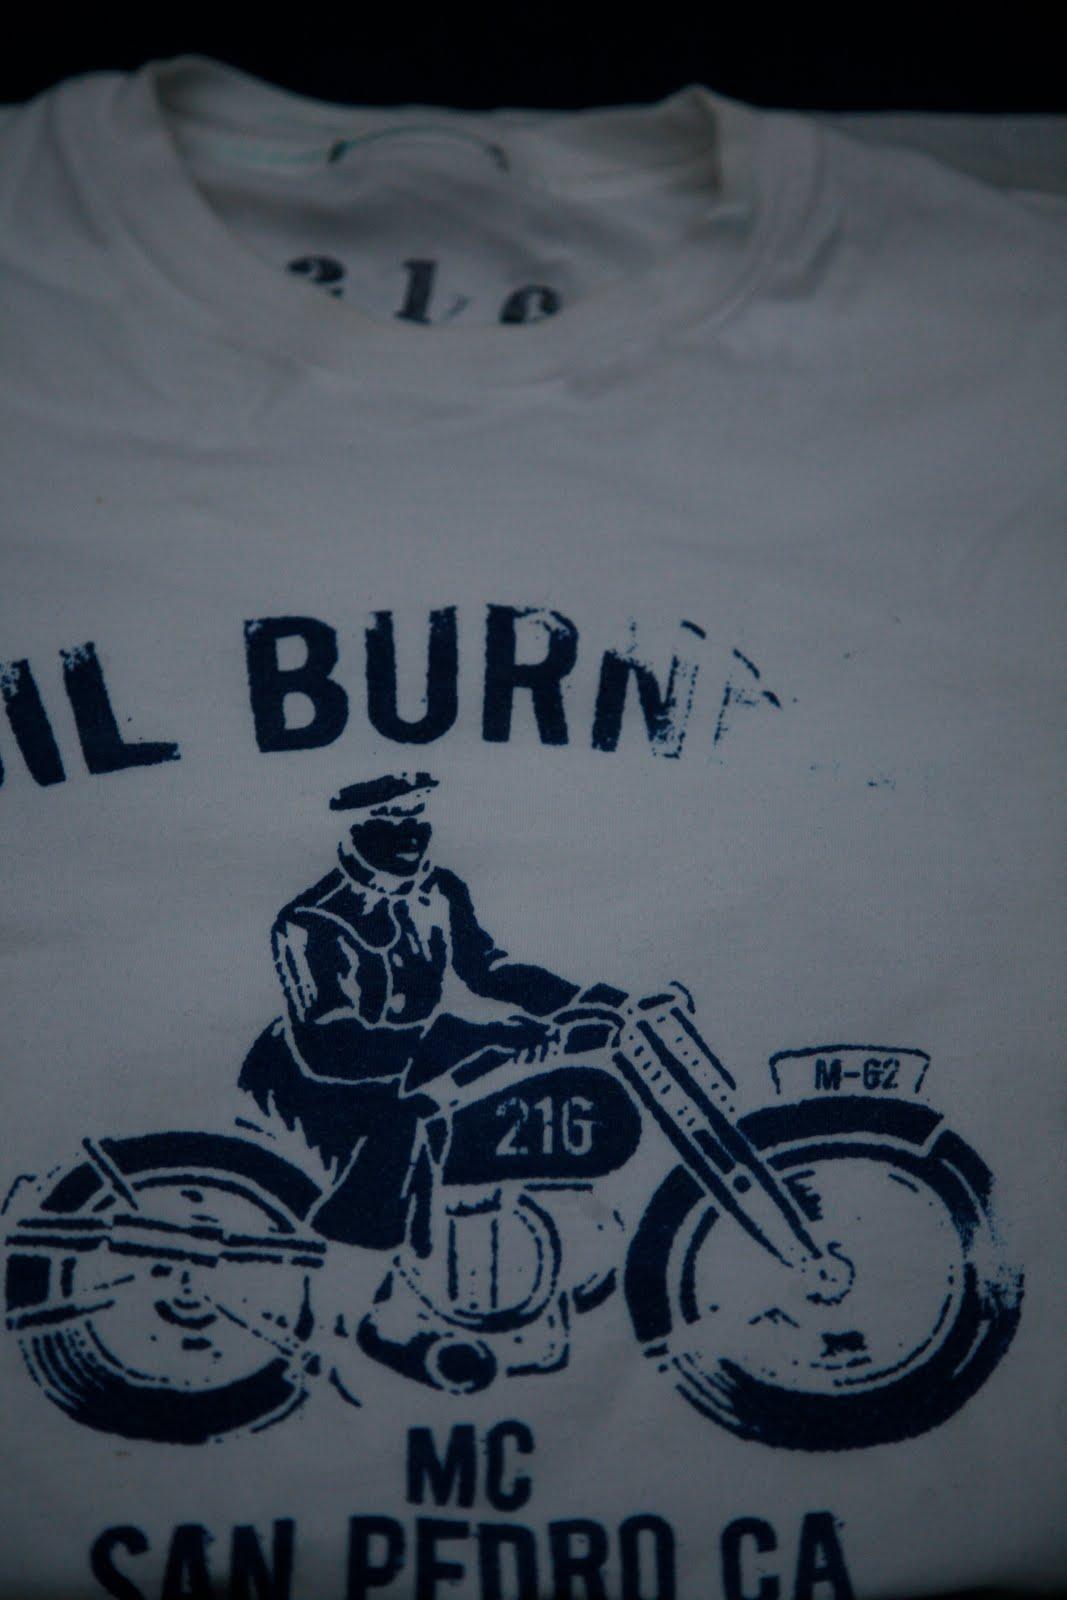 b36432b2873 216 union oil burners san pedro ca air rider t shirt